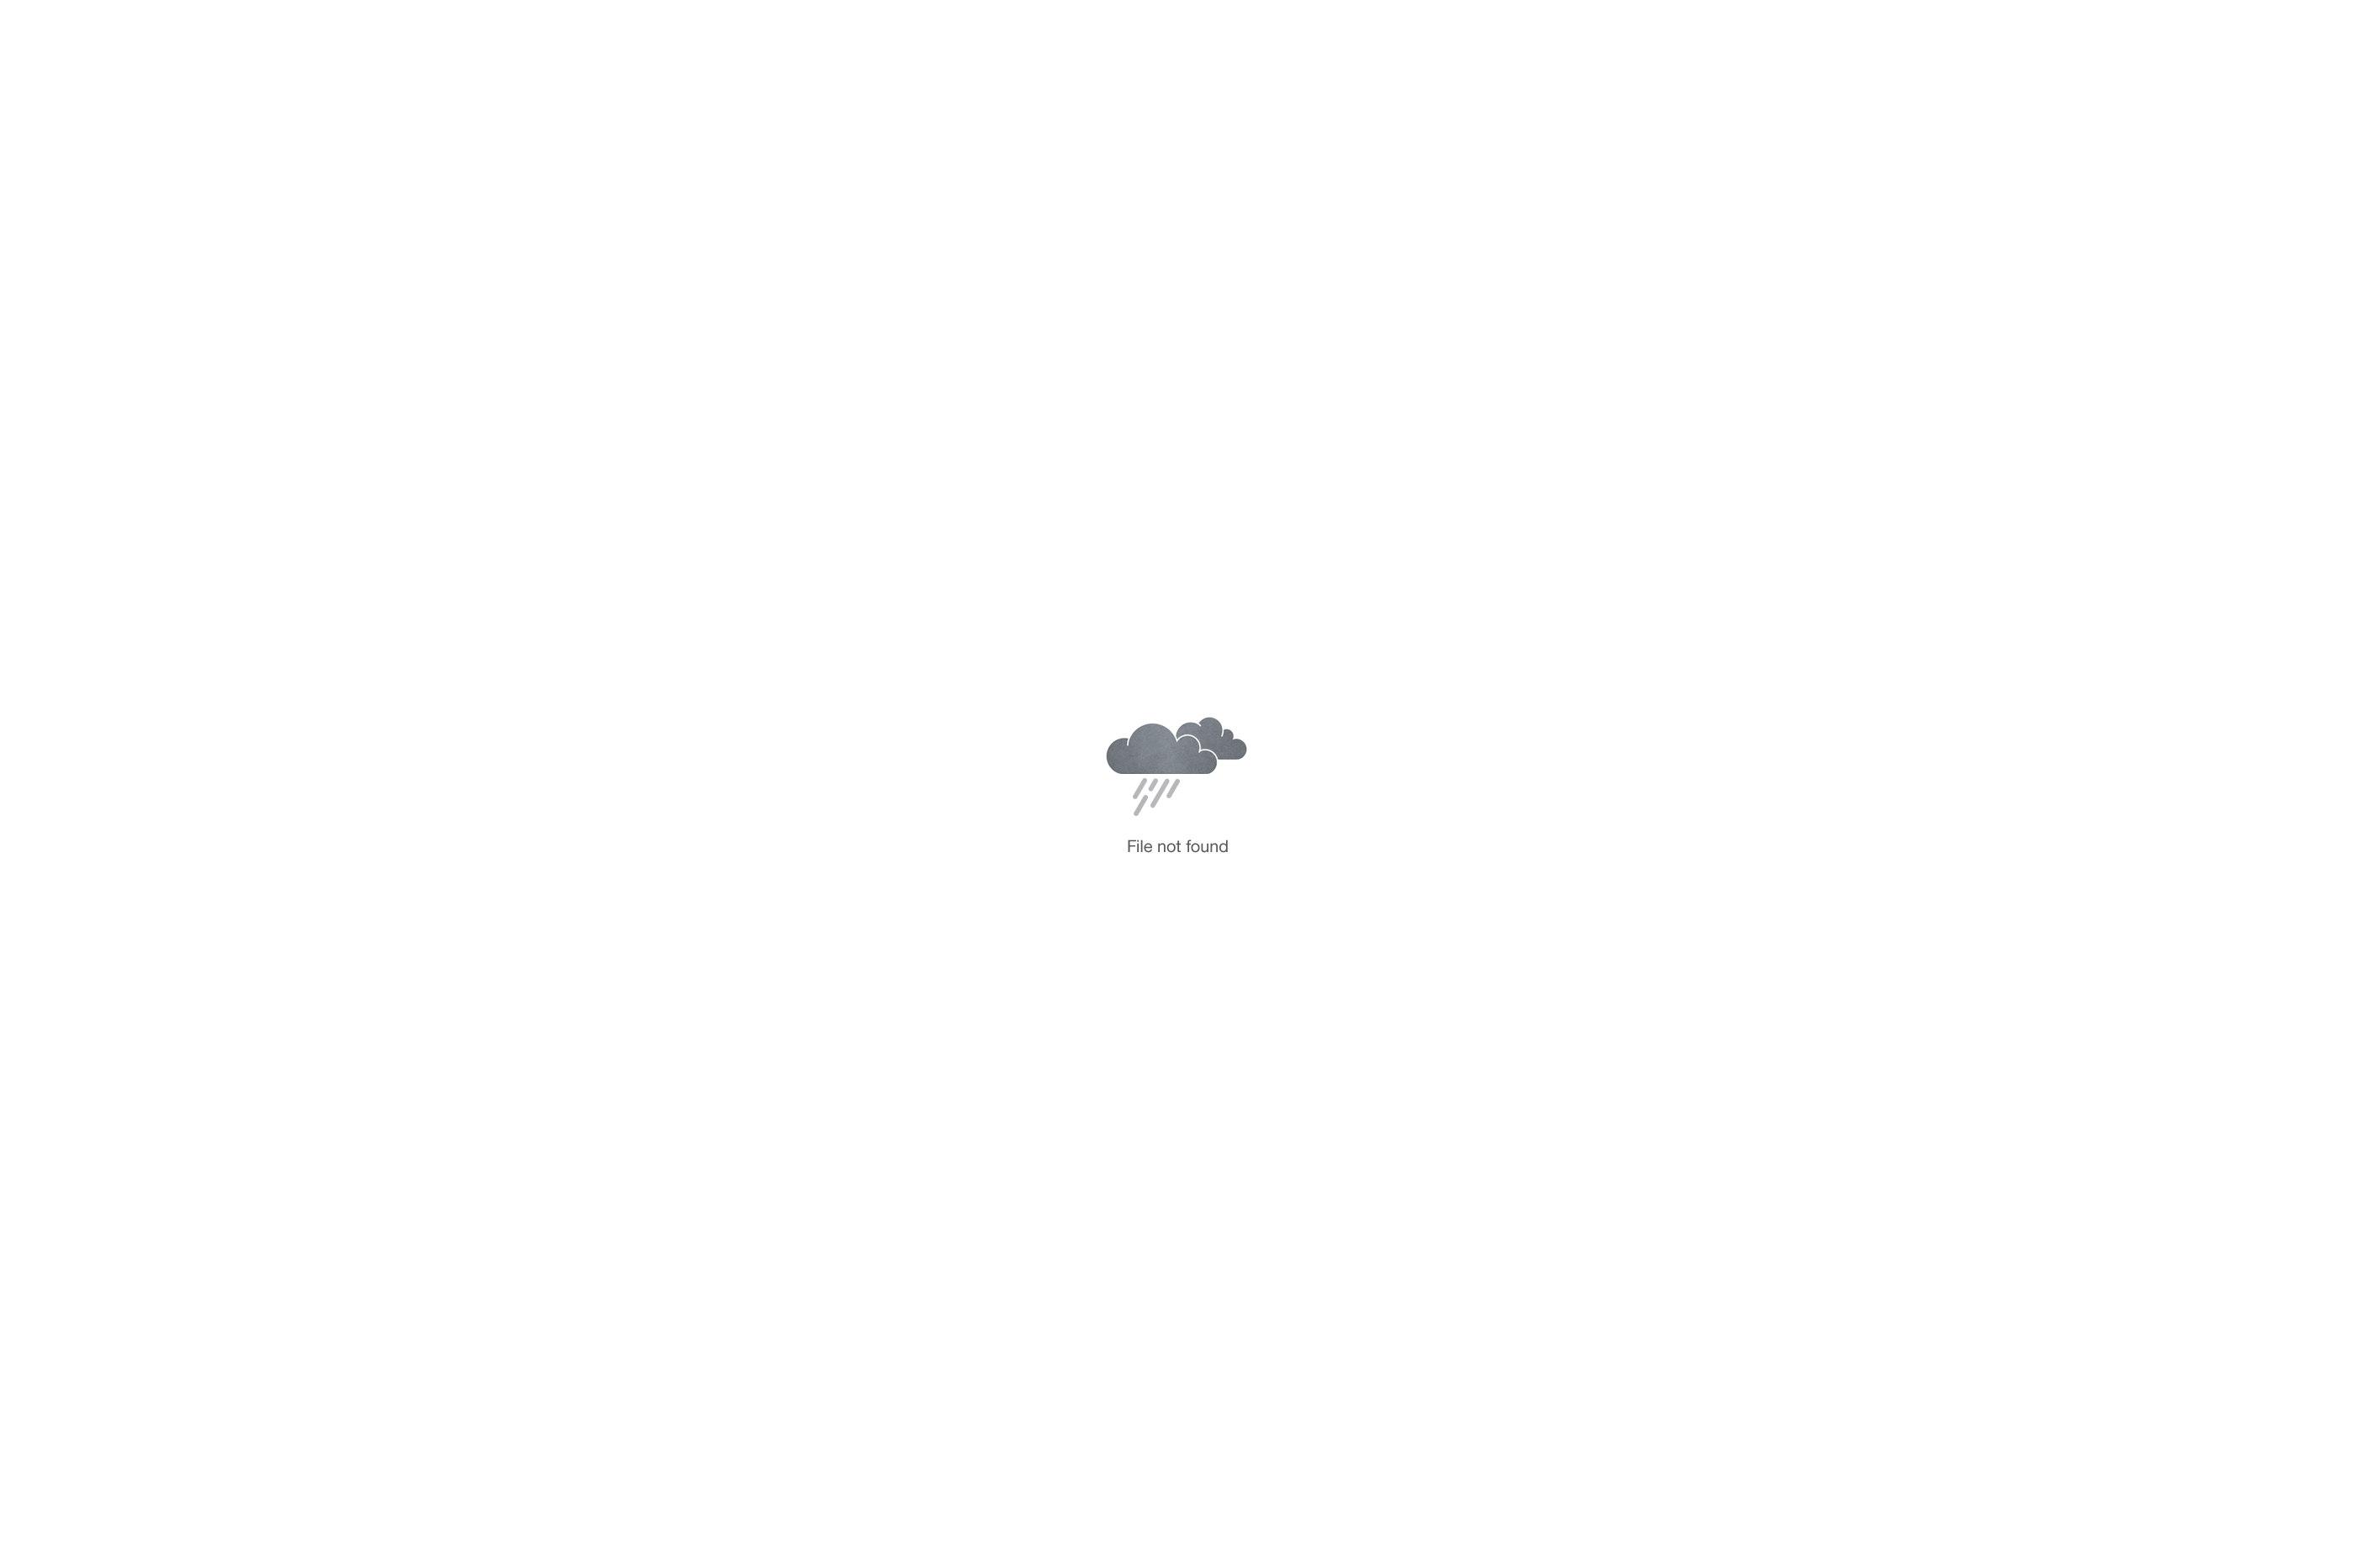 Antoine-PEDUZZI-Trail-Sponsorise-me-image-2